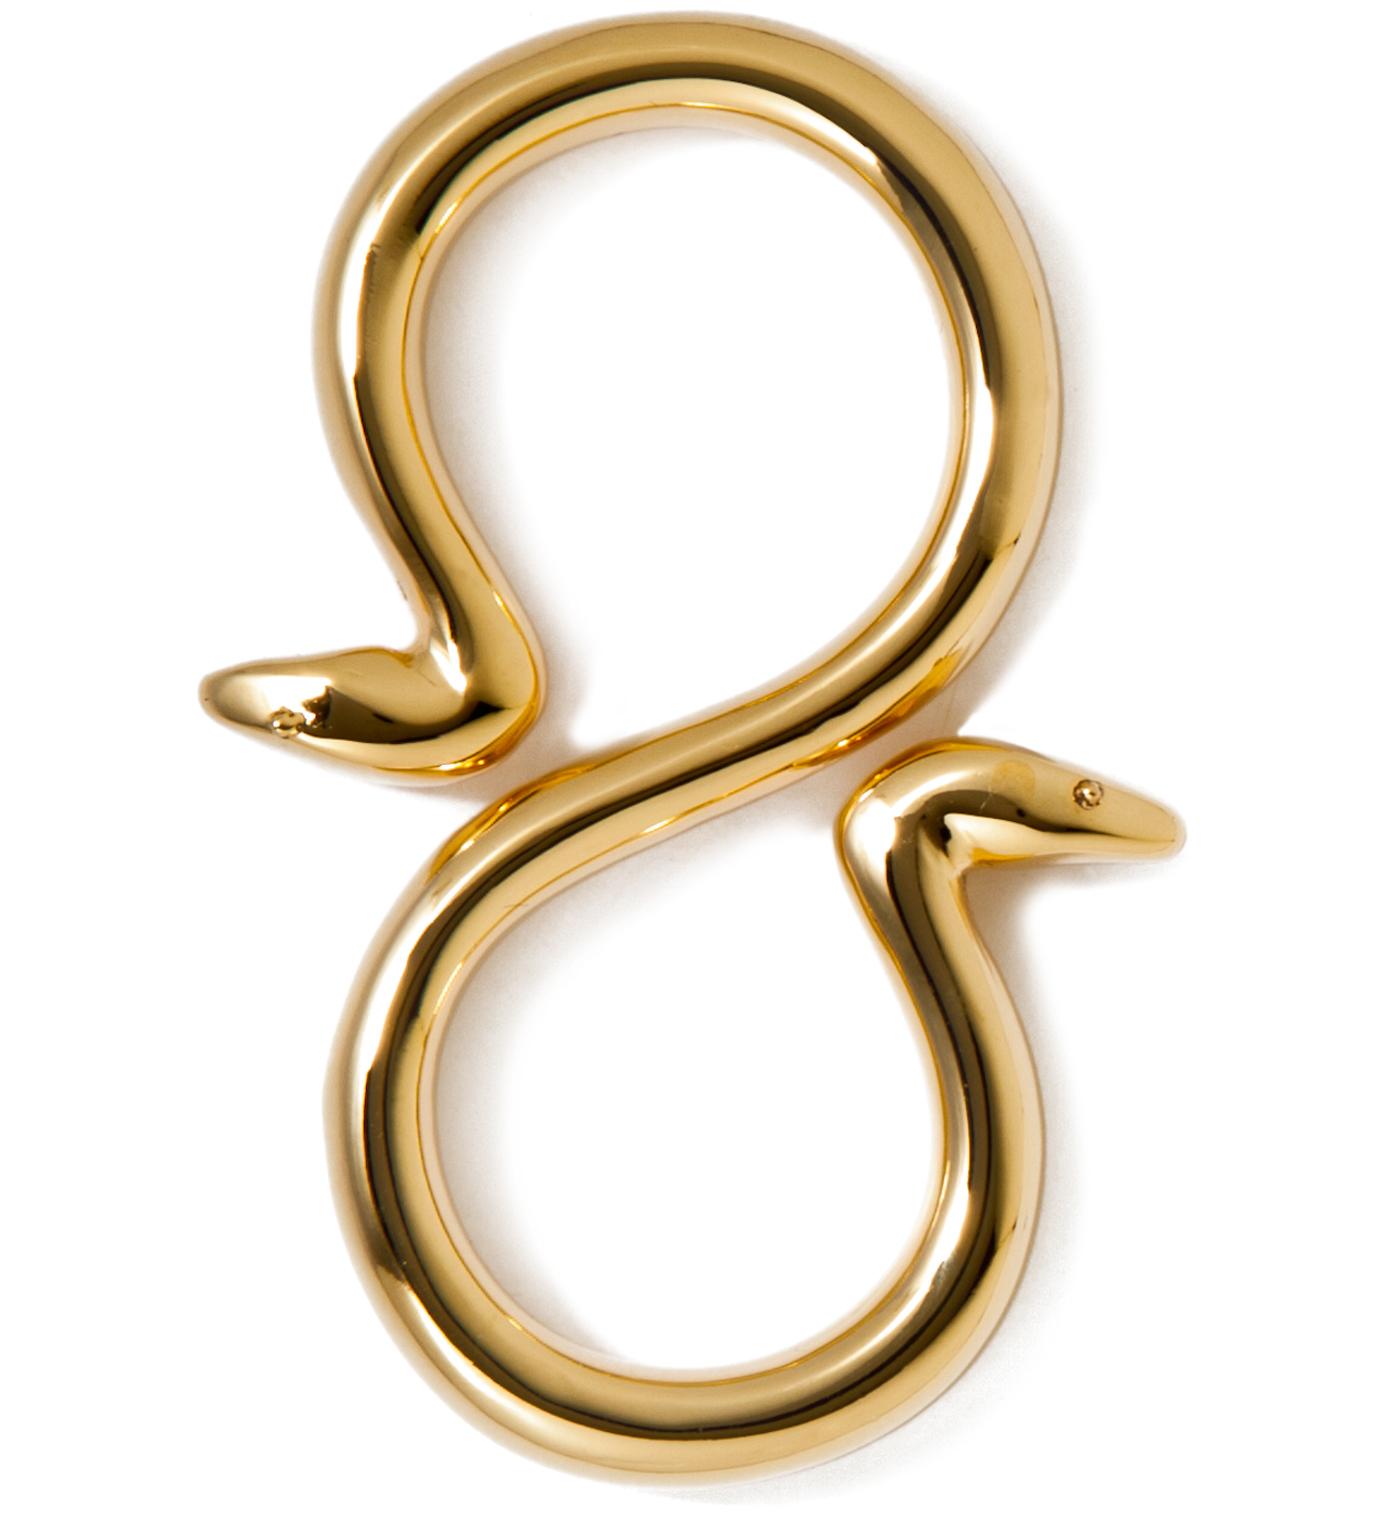 Mister Stevin Gold x Mister Gold Snake Hook